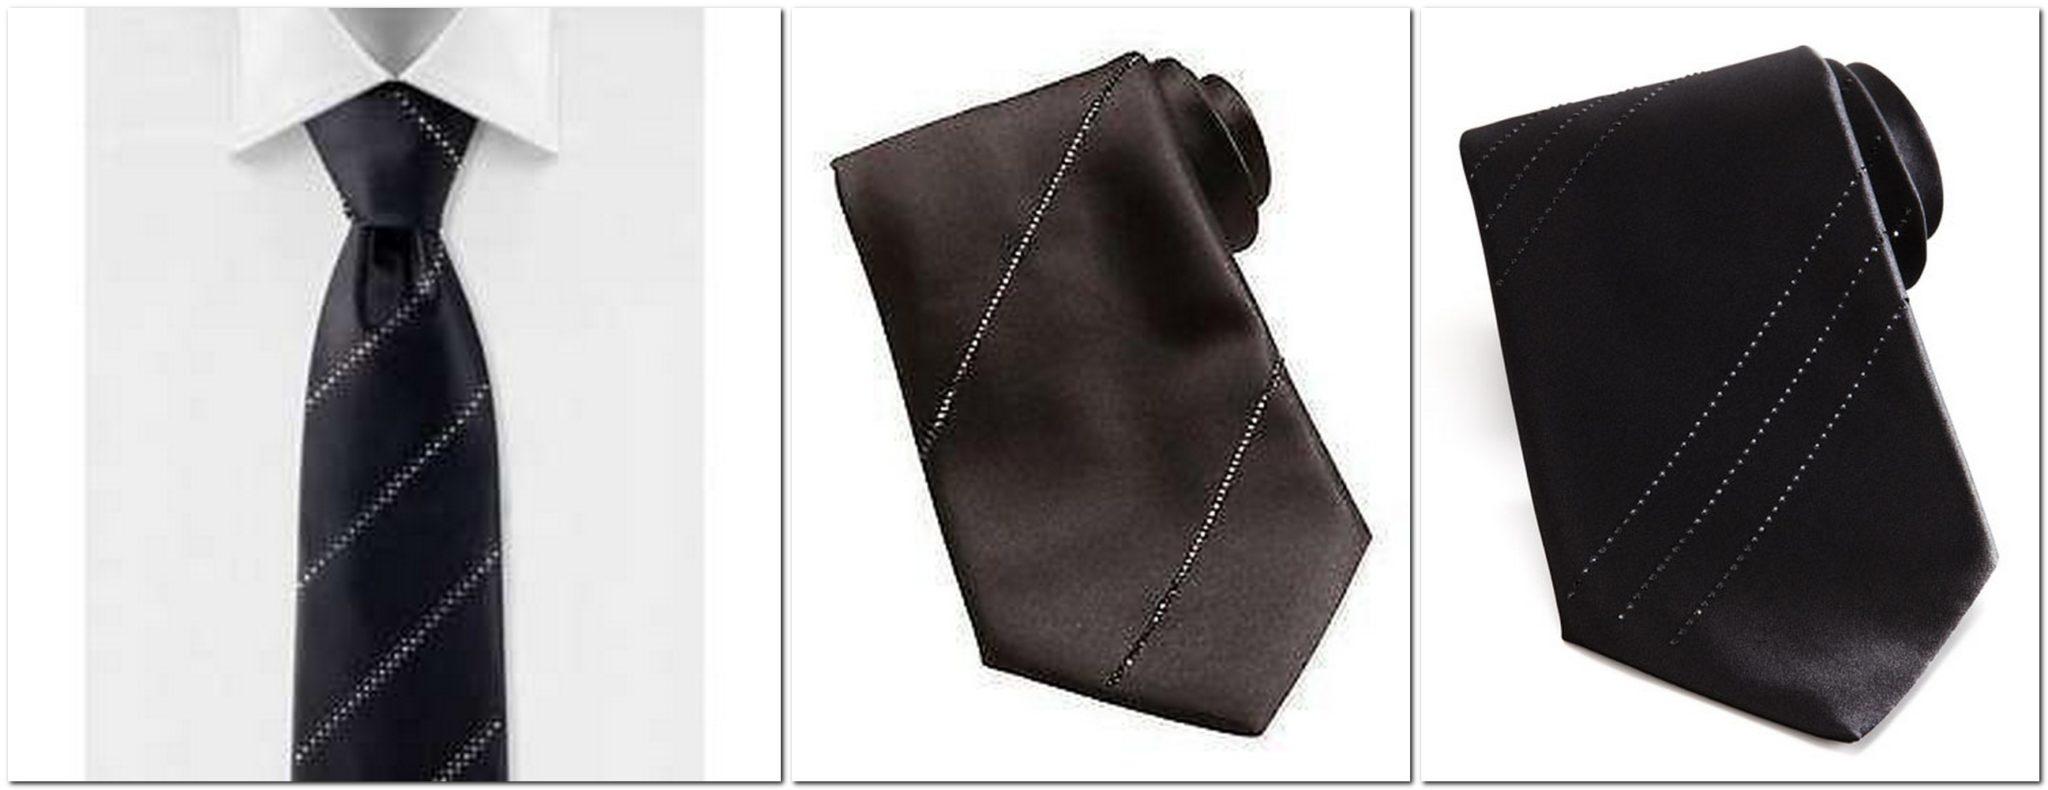 Stefano Ricci's formal crystal tie